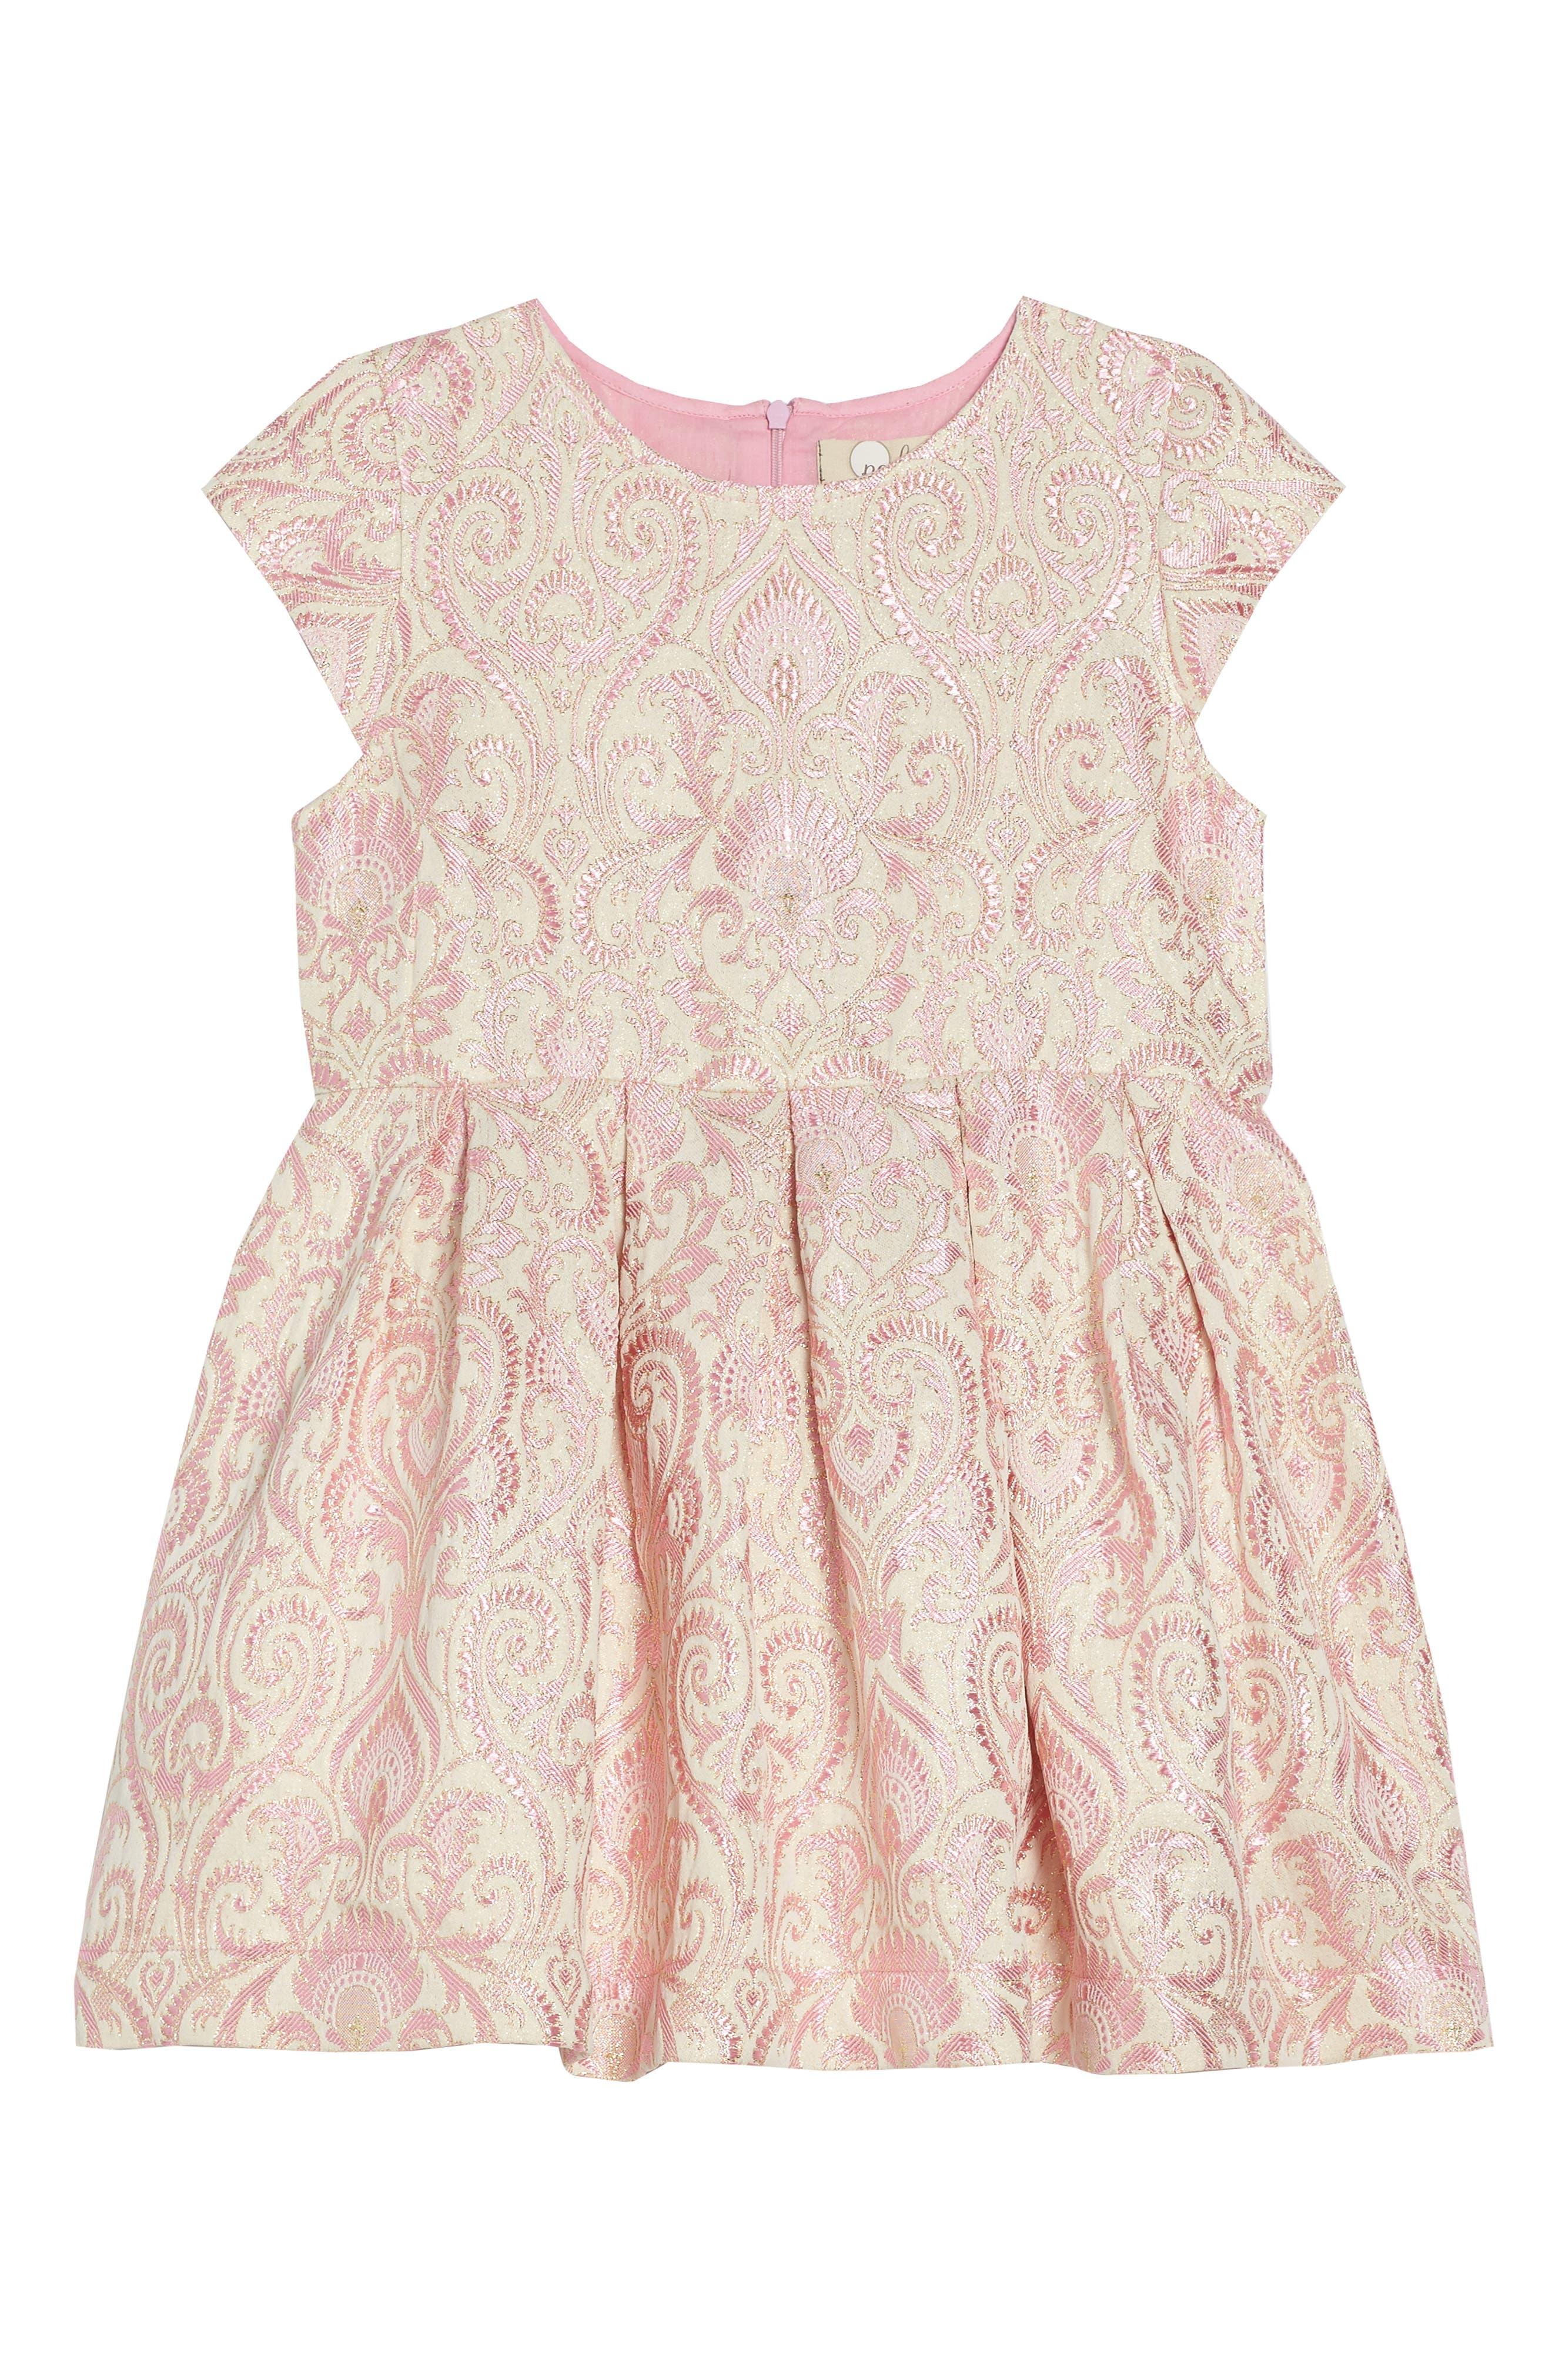 Lenox Brocade Dress,                         Main,                         color, Pink